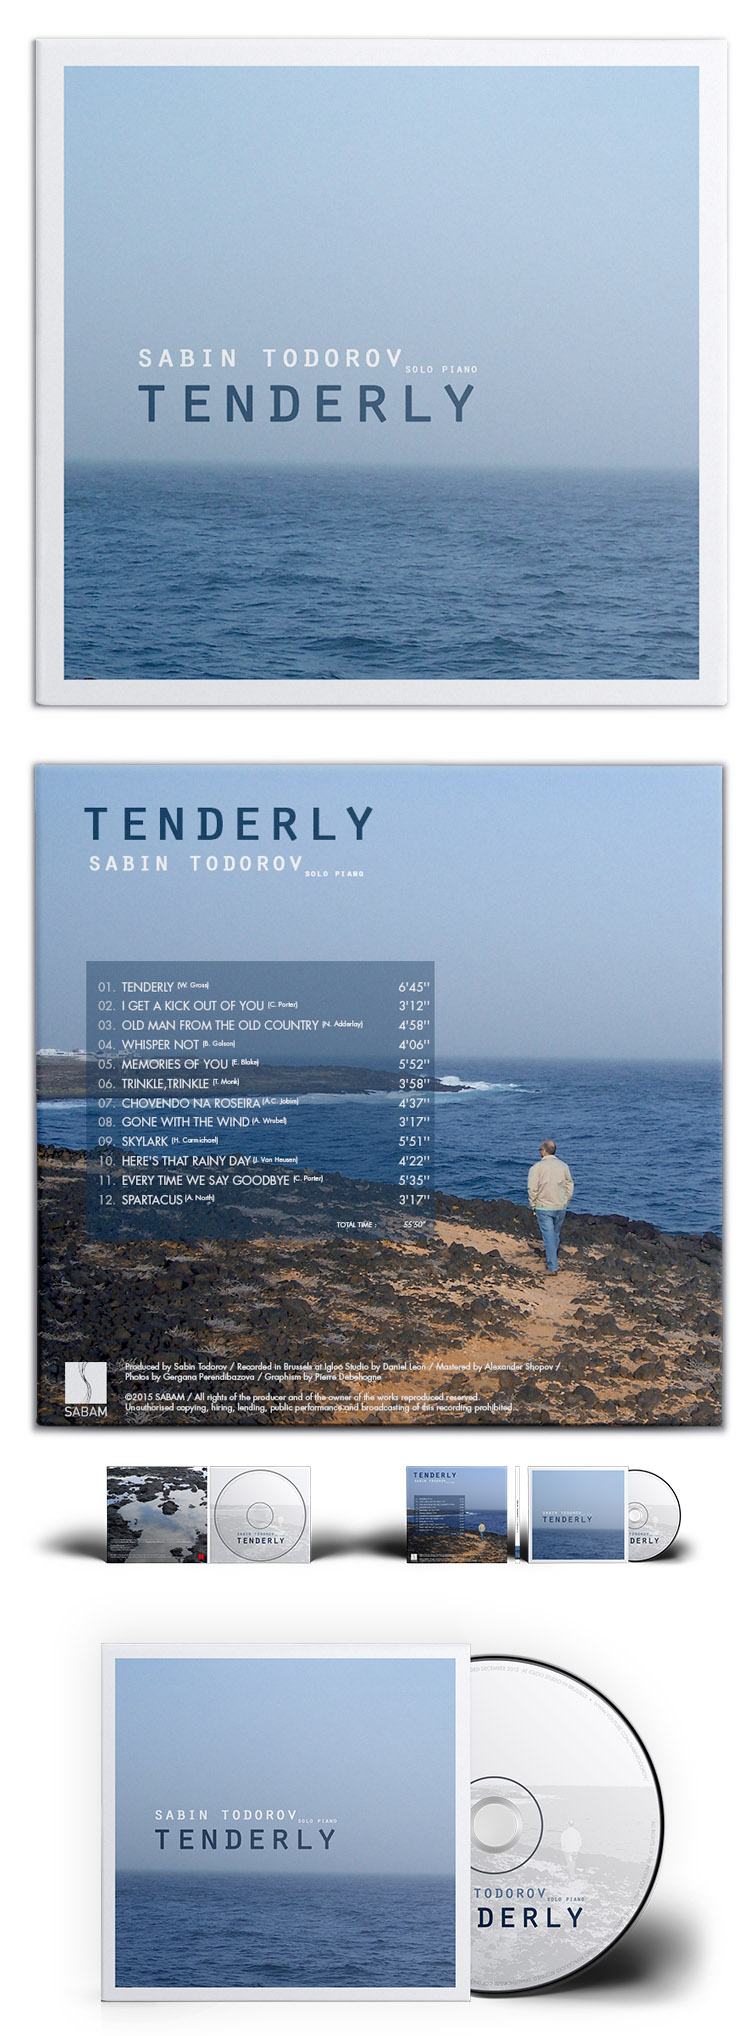 Sabin_CD-cover